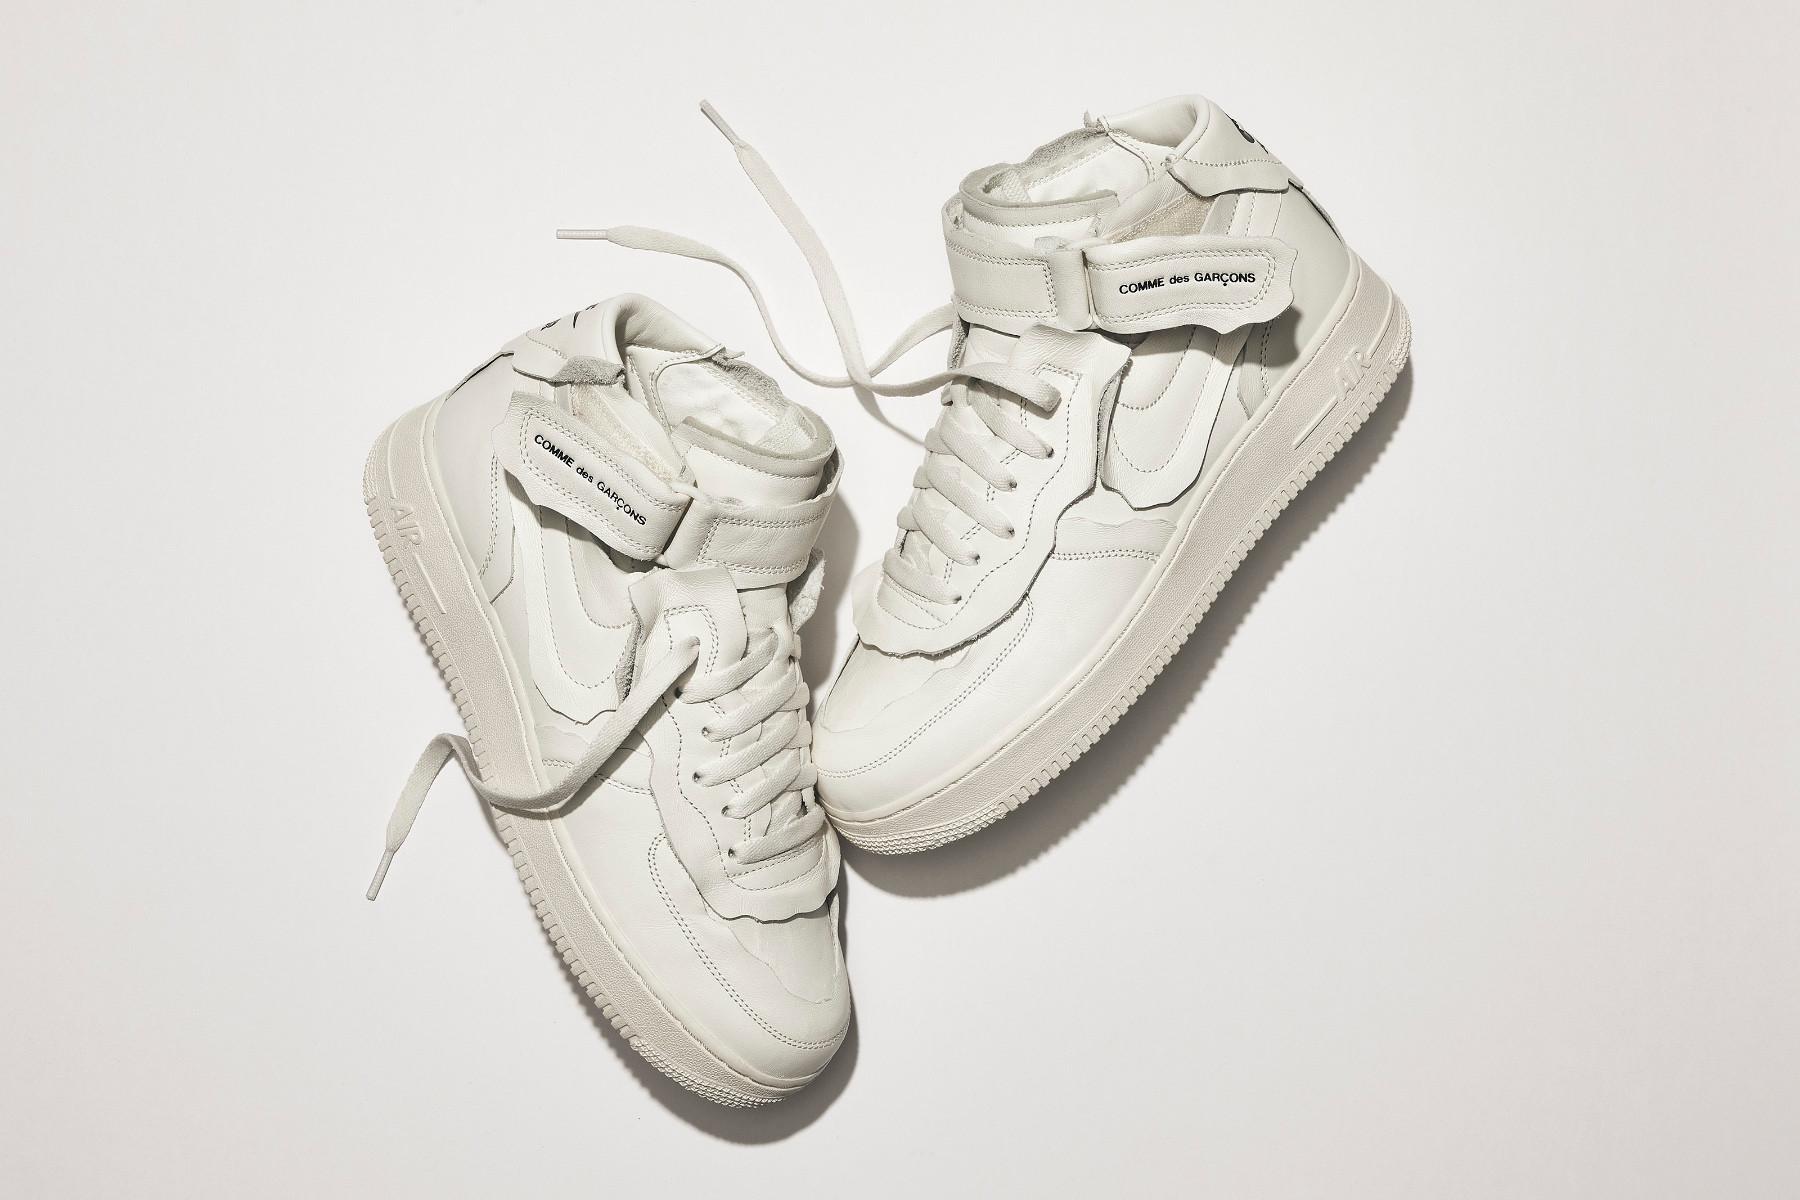 COMME des GARÇONS x Nike Air Force 1 Mid white CDG